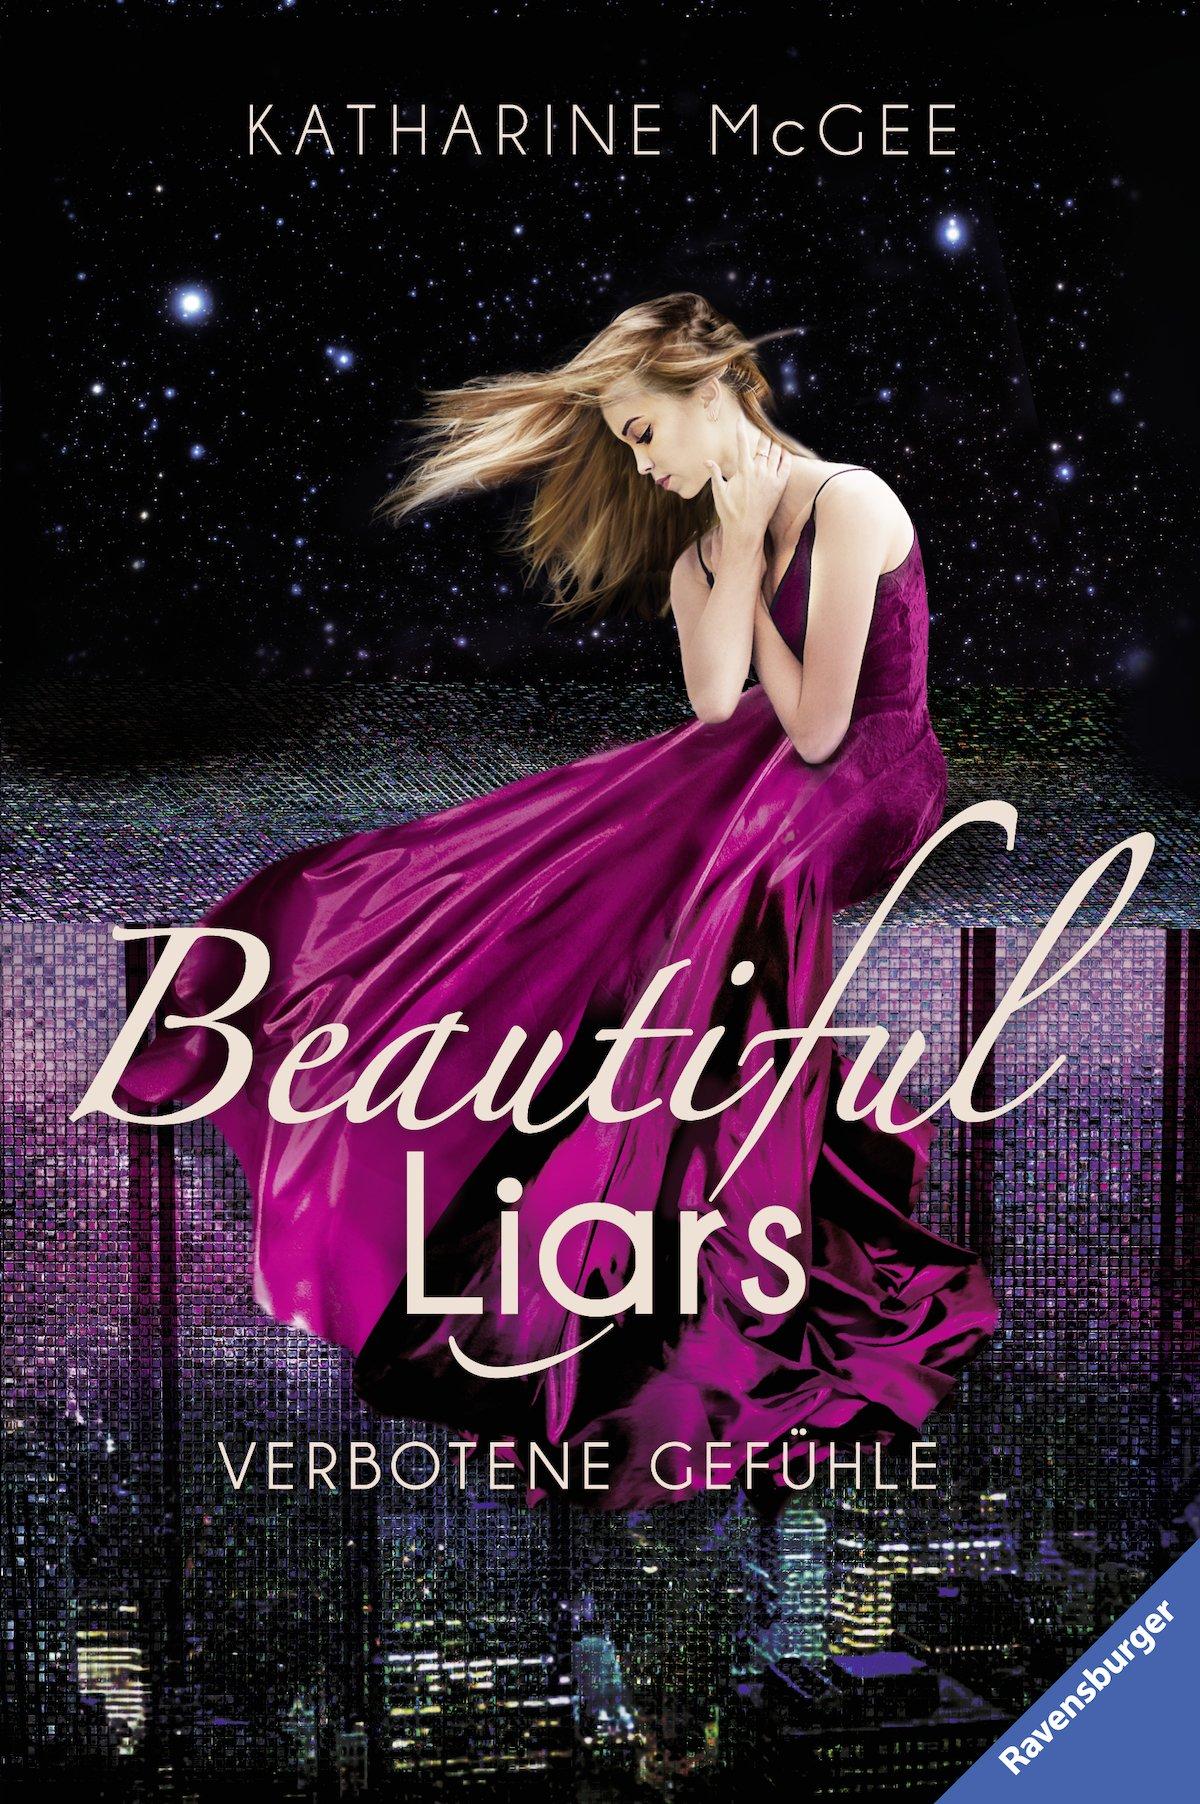 [Rezension] Beautiful Liars – Verbotene Gefühle (Band 1), Katharine McGee